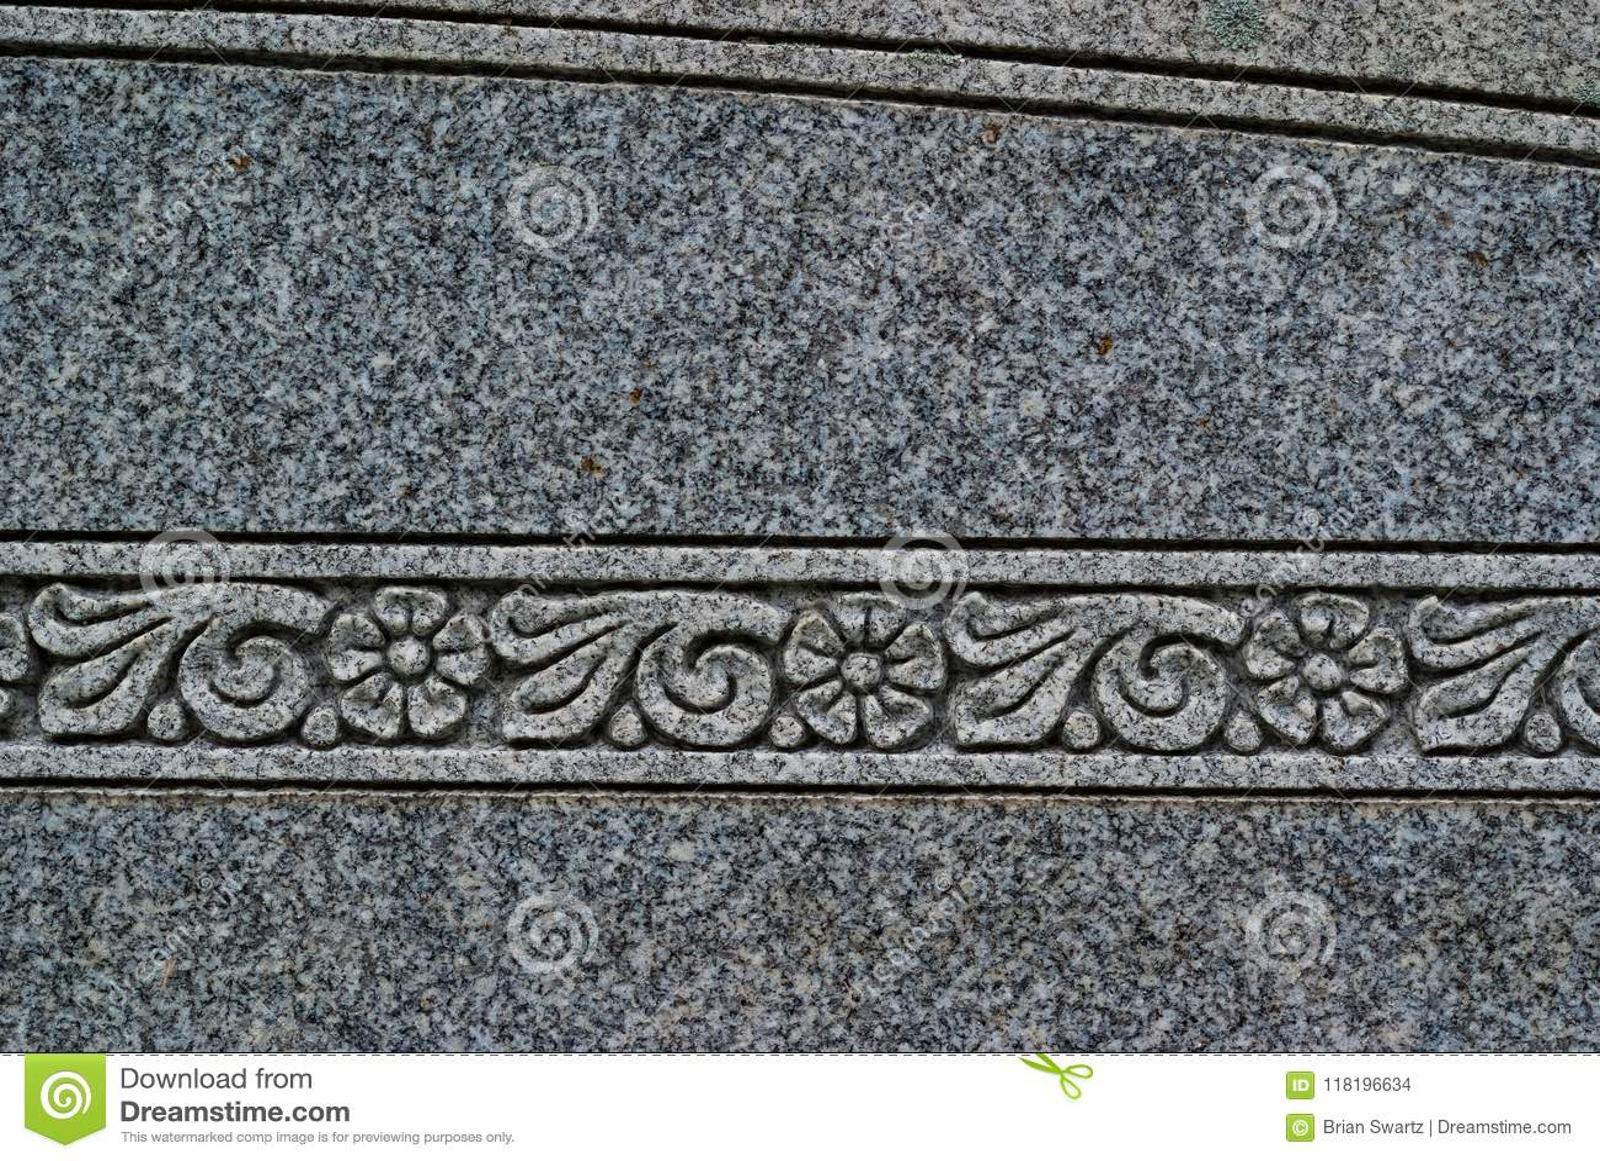 Cemetery Art 4321